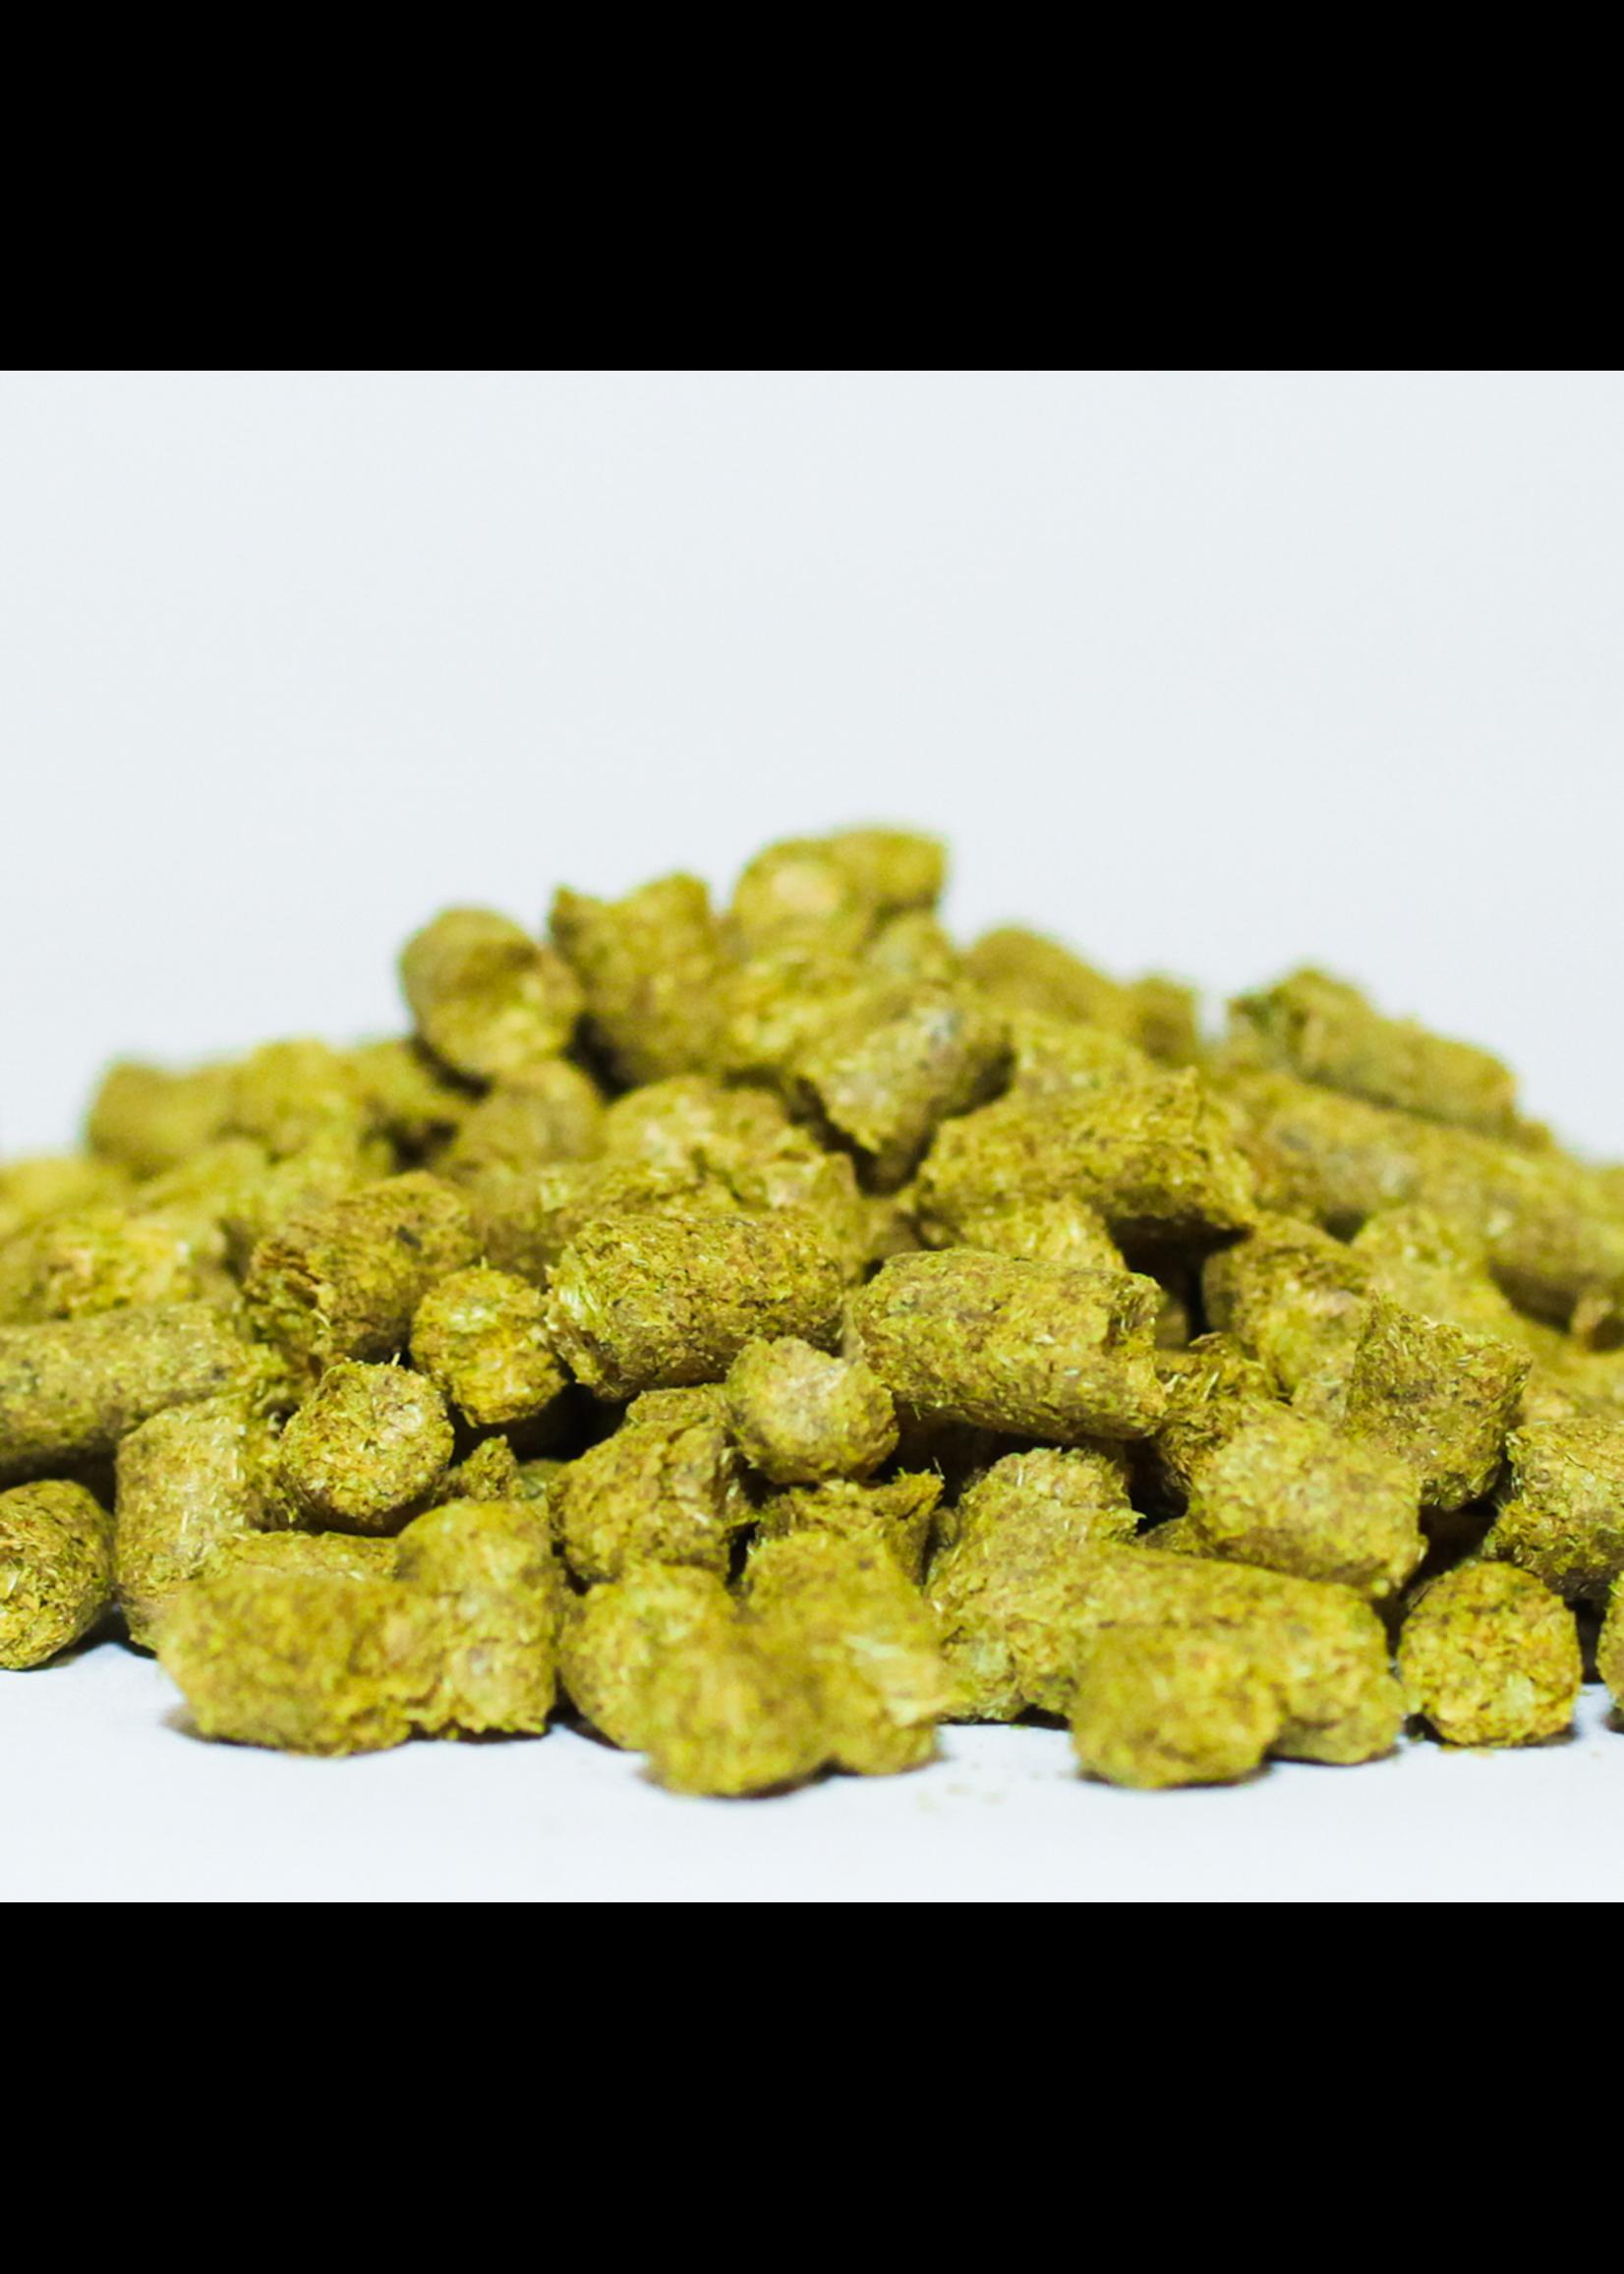 Hops Nugget Hops (US) - Pellets - 1 oz